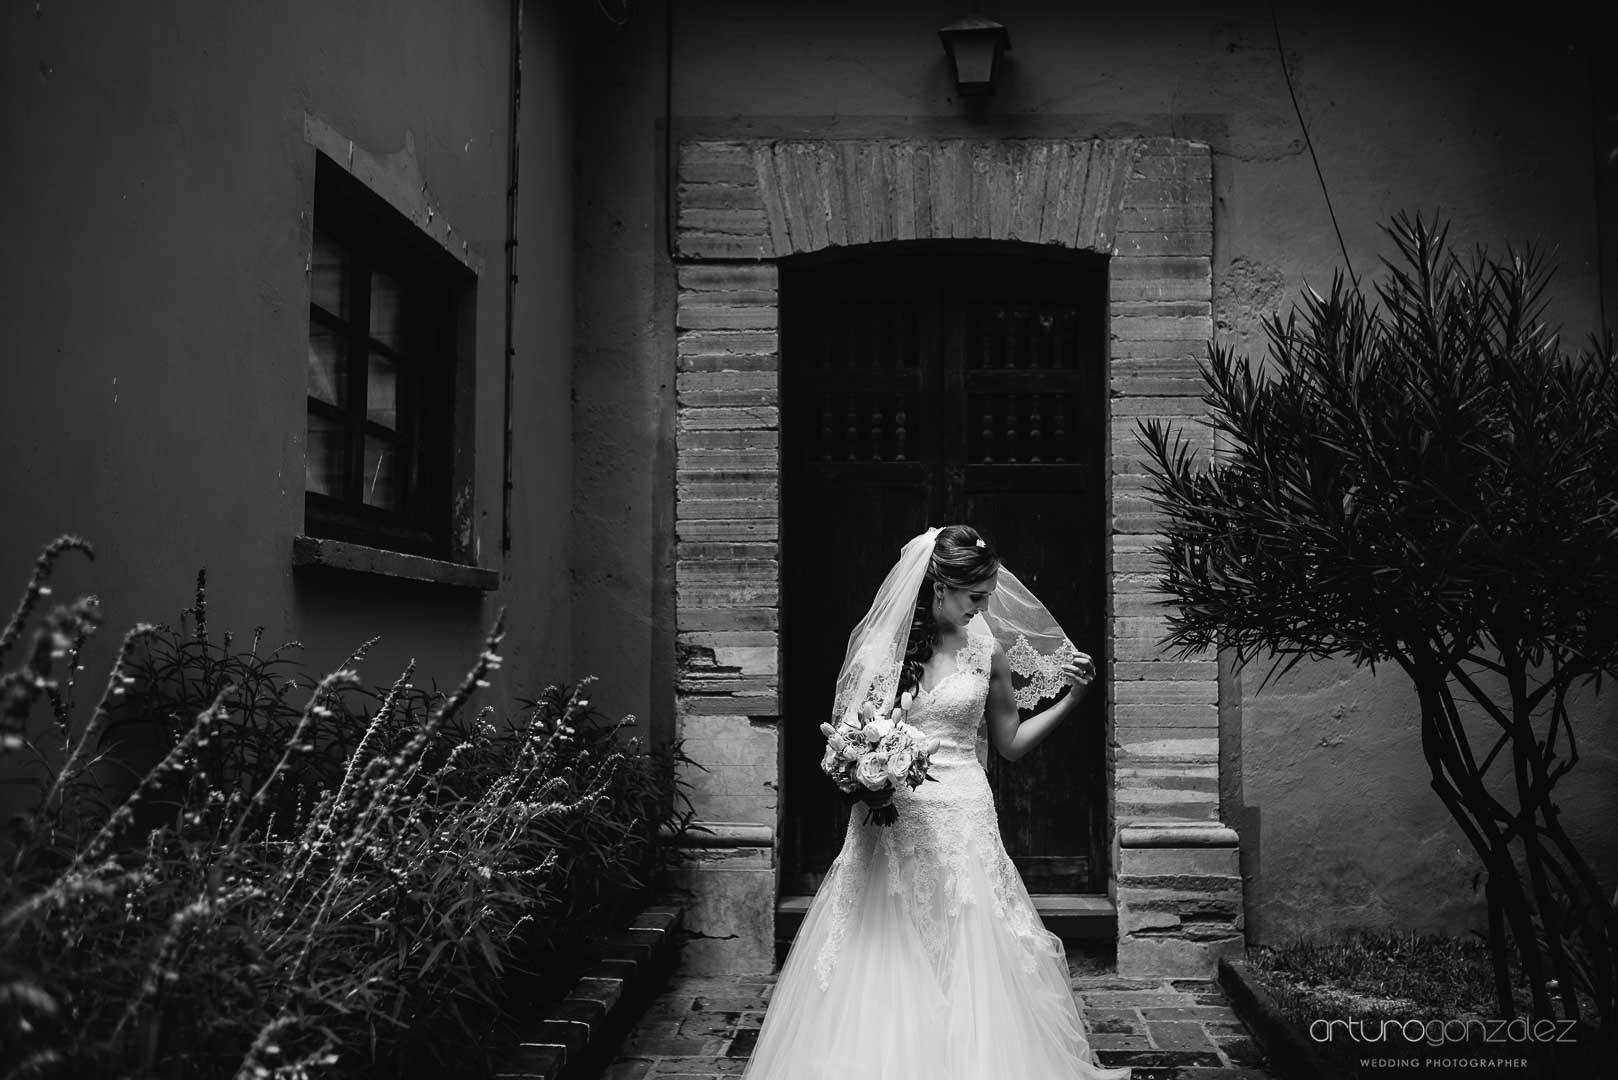 fotografo-de-bodas-en-guanajuato-27